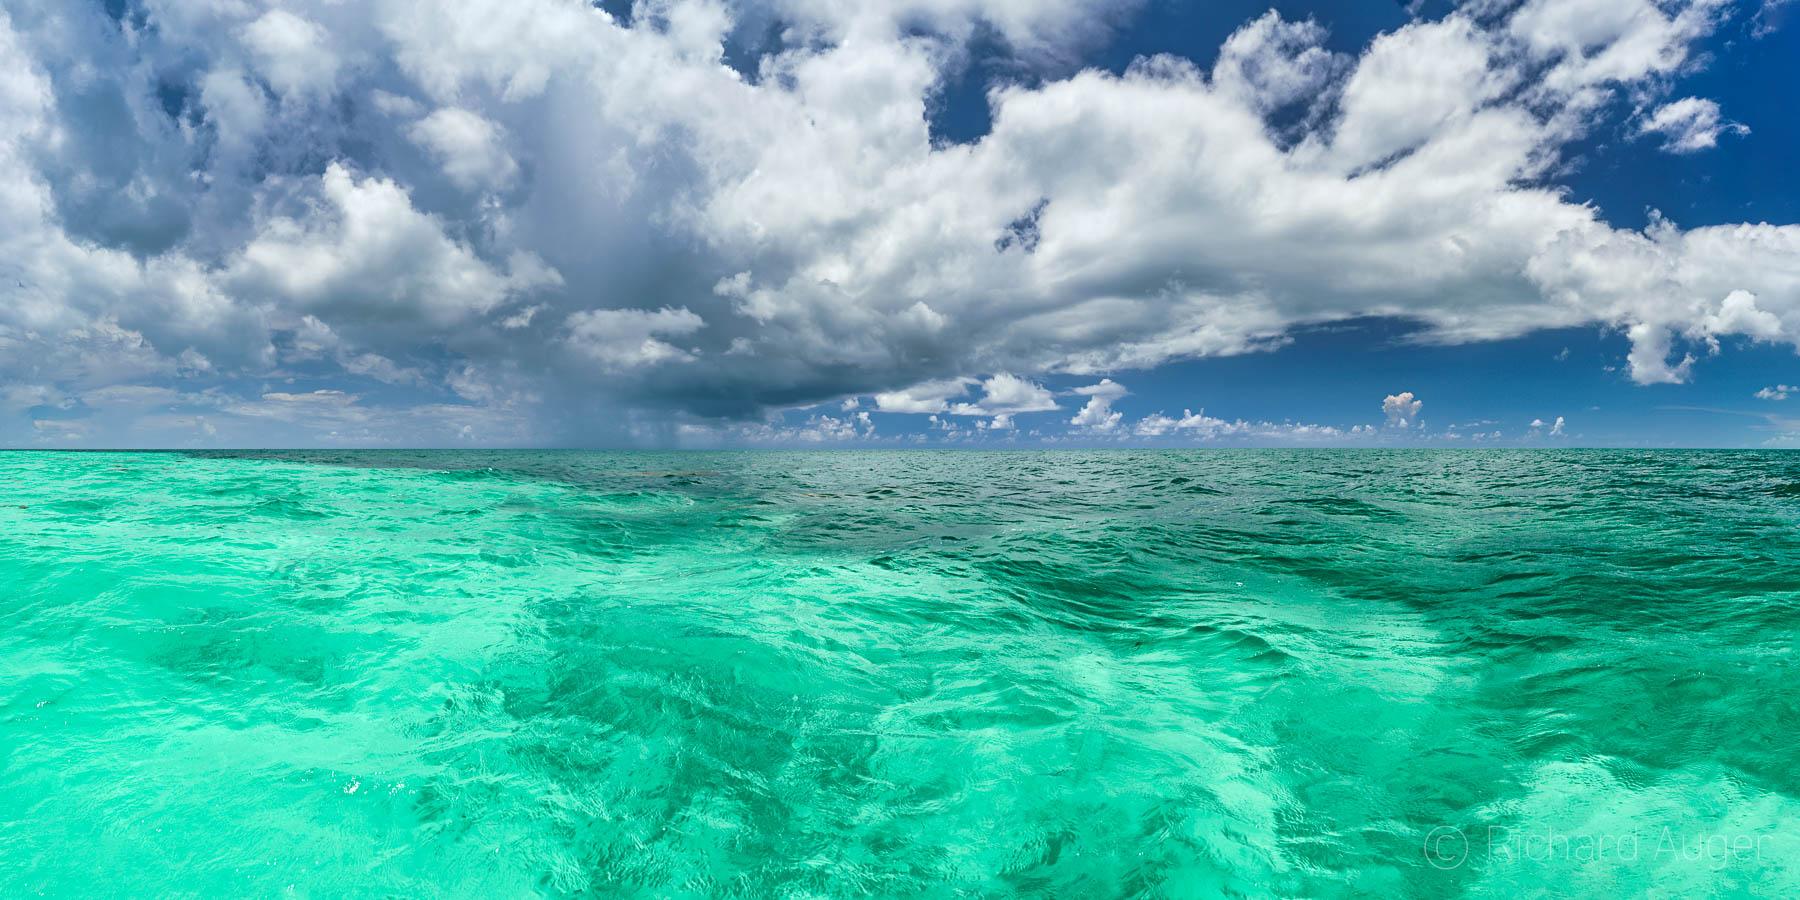 Ocean Storm, Florida Keys